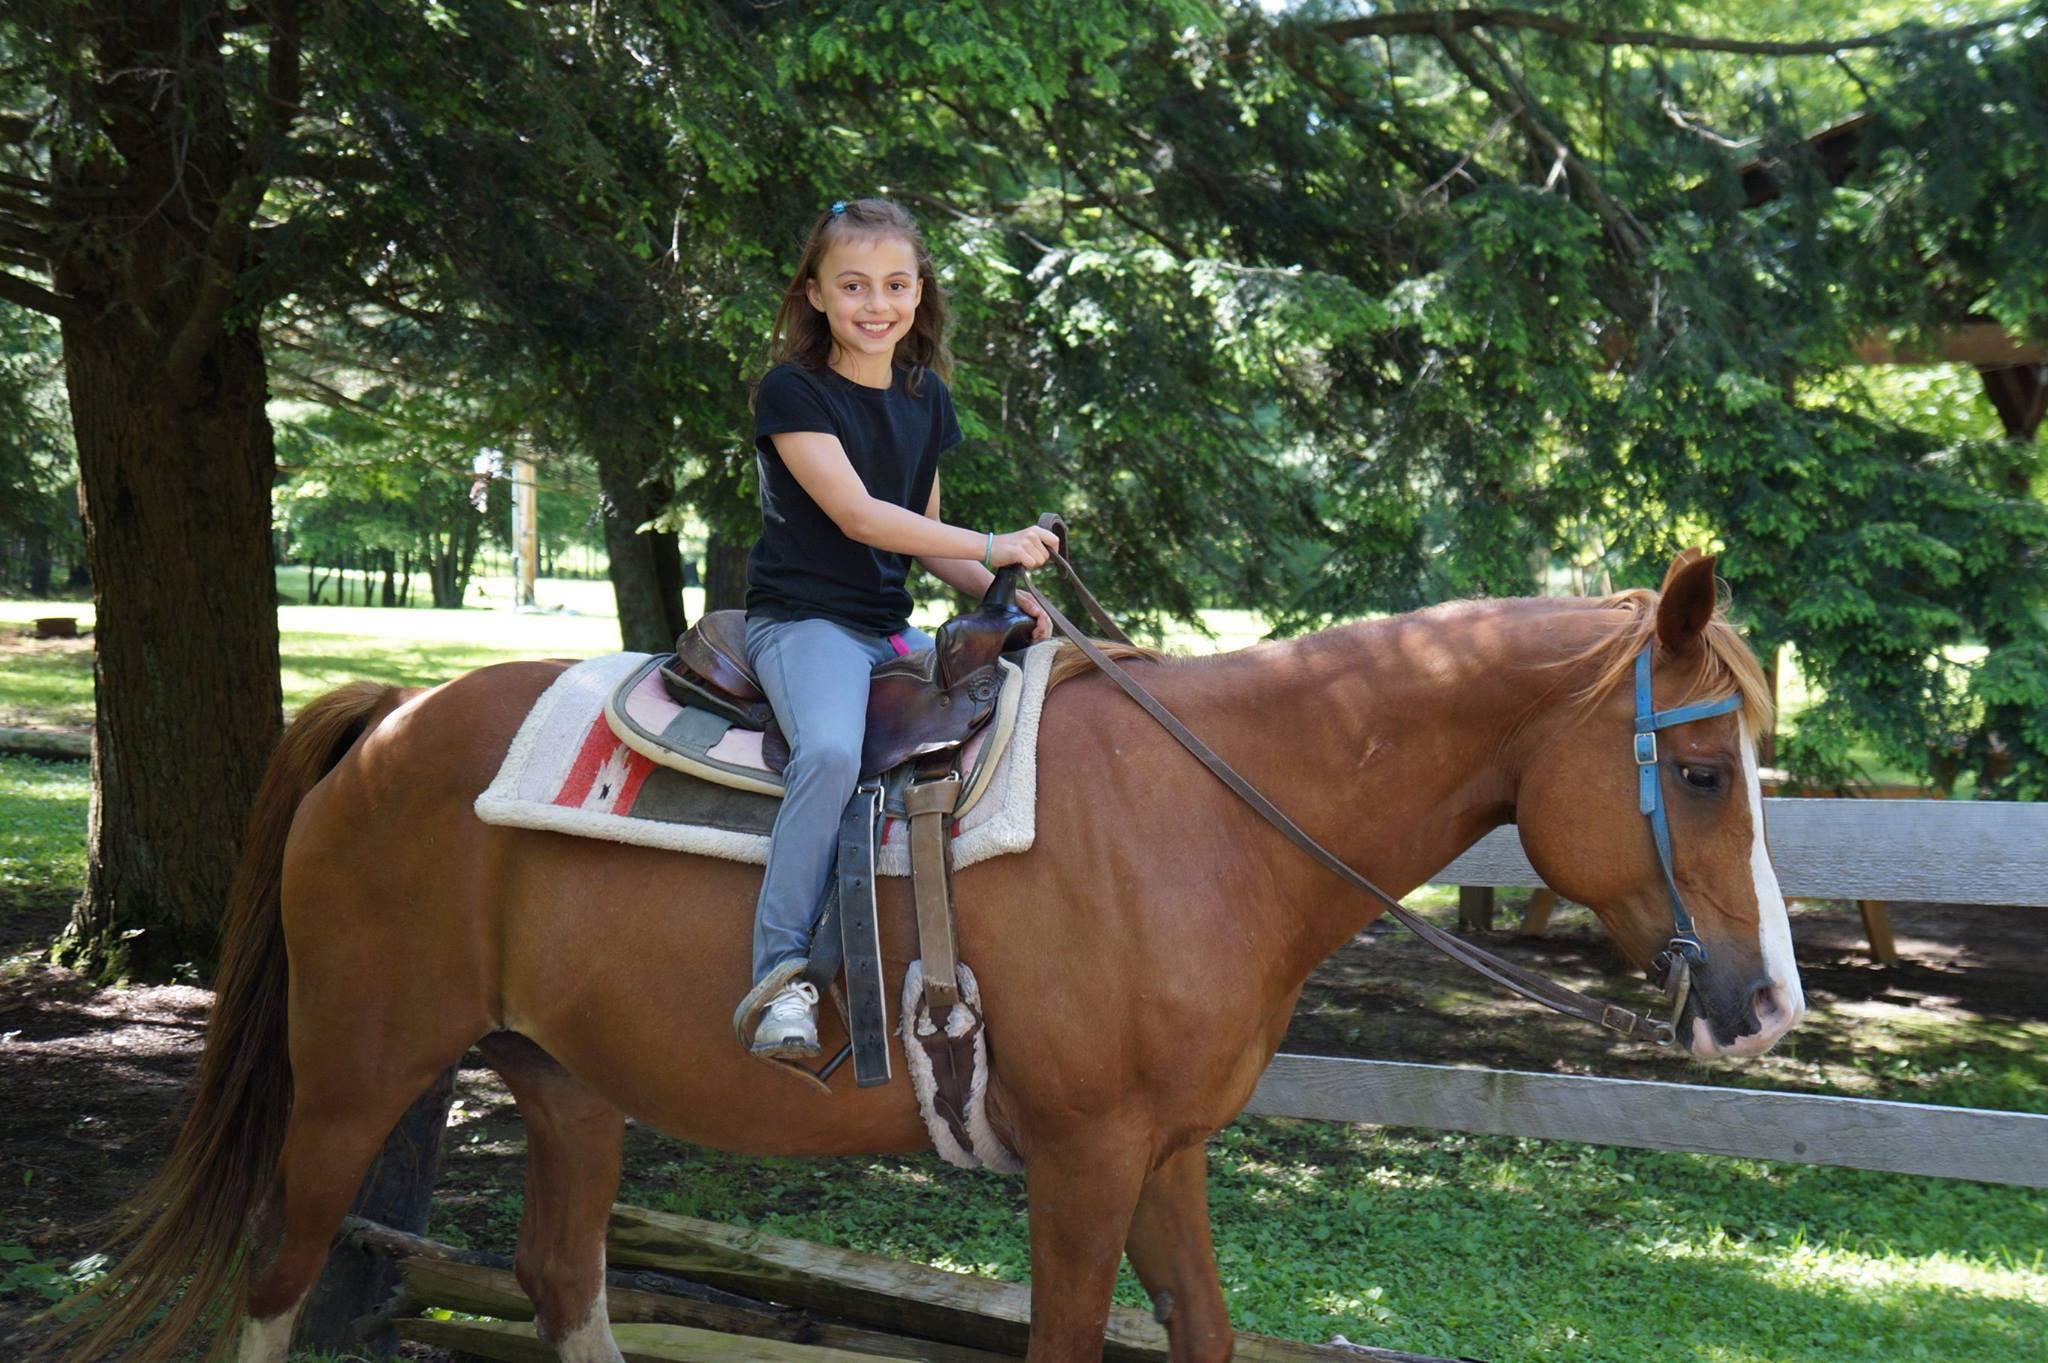 Equestrian Trails, Horseback Riding, Stables - PA   Visit PA